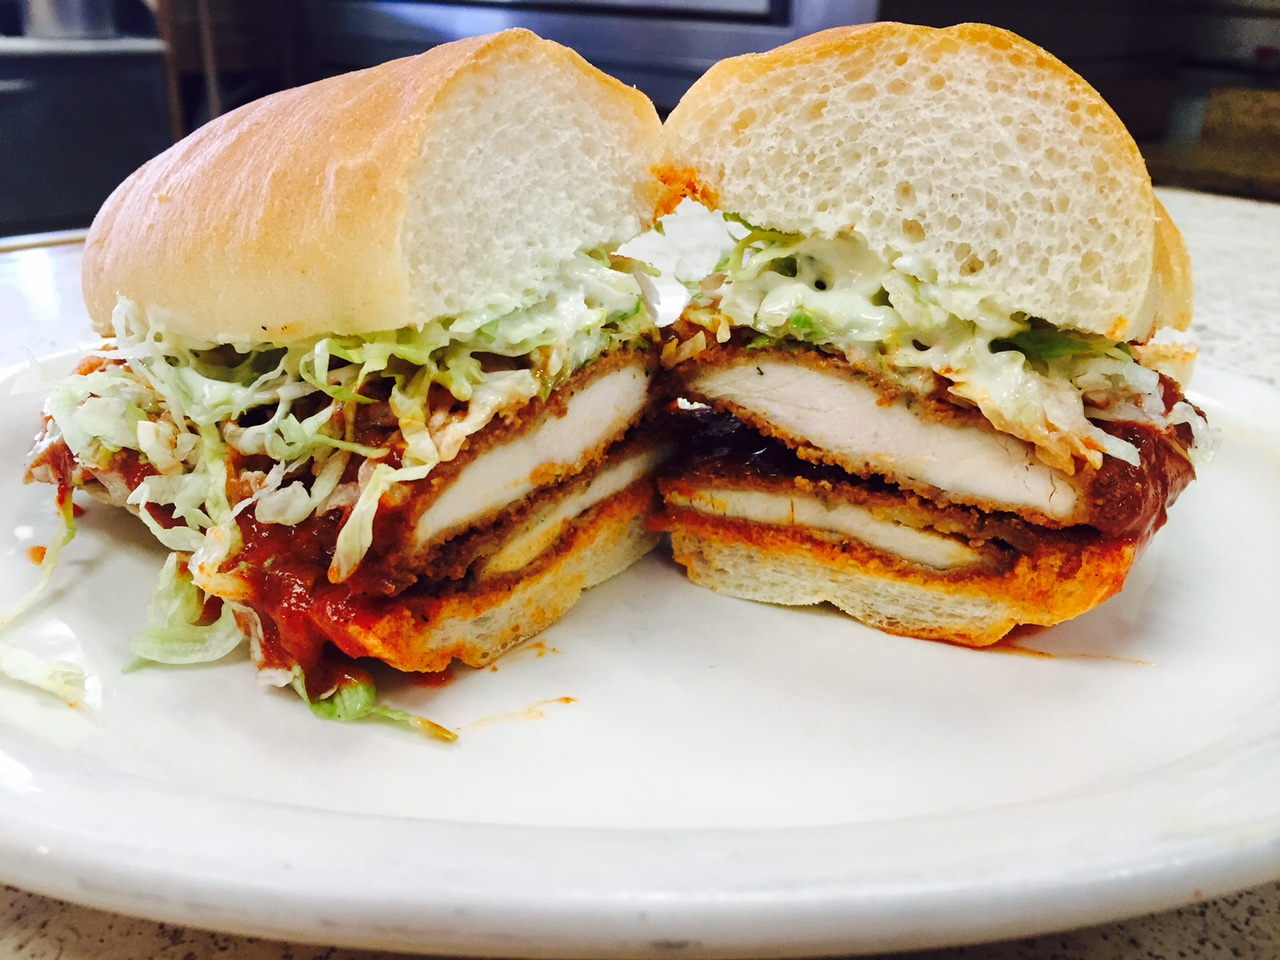 d0a1adc4b517811fc817_Buff_chicken_sandwich.jpg